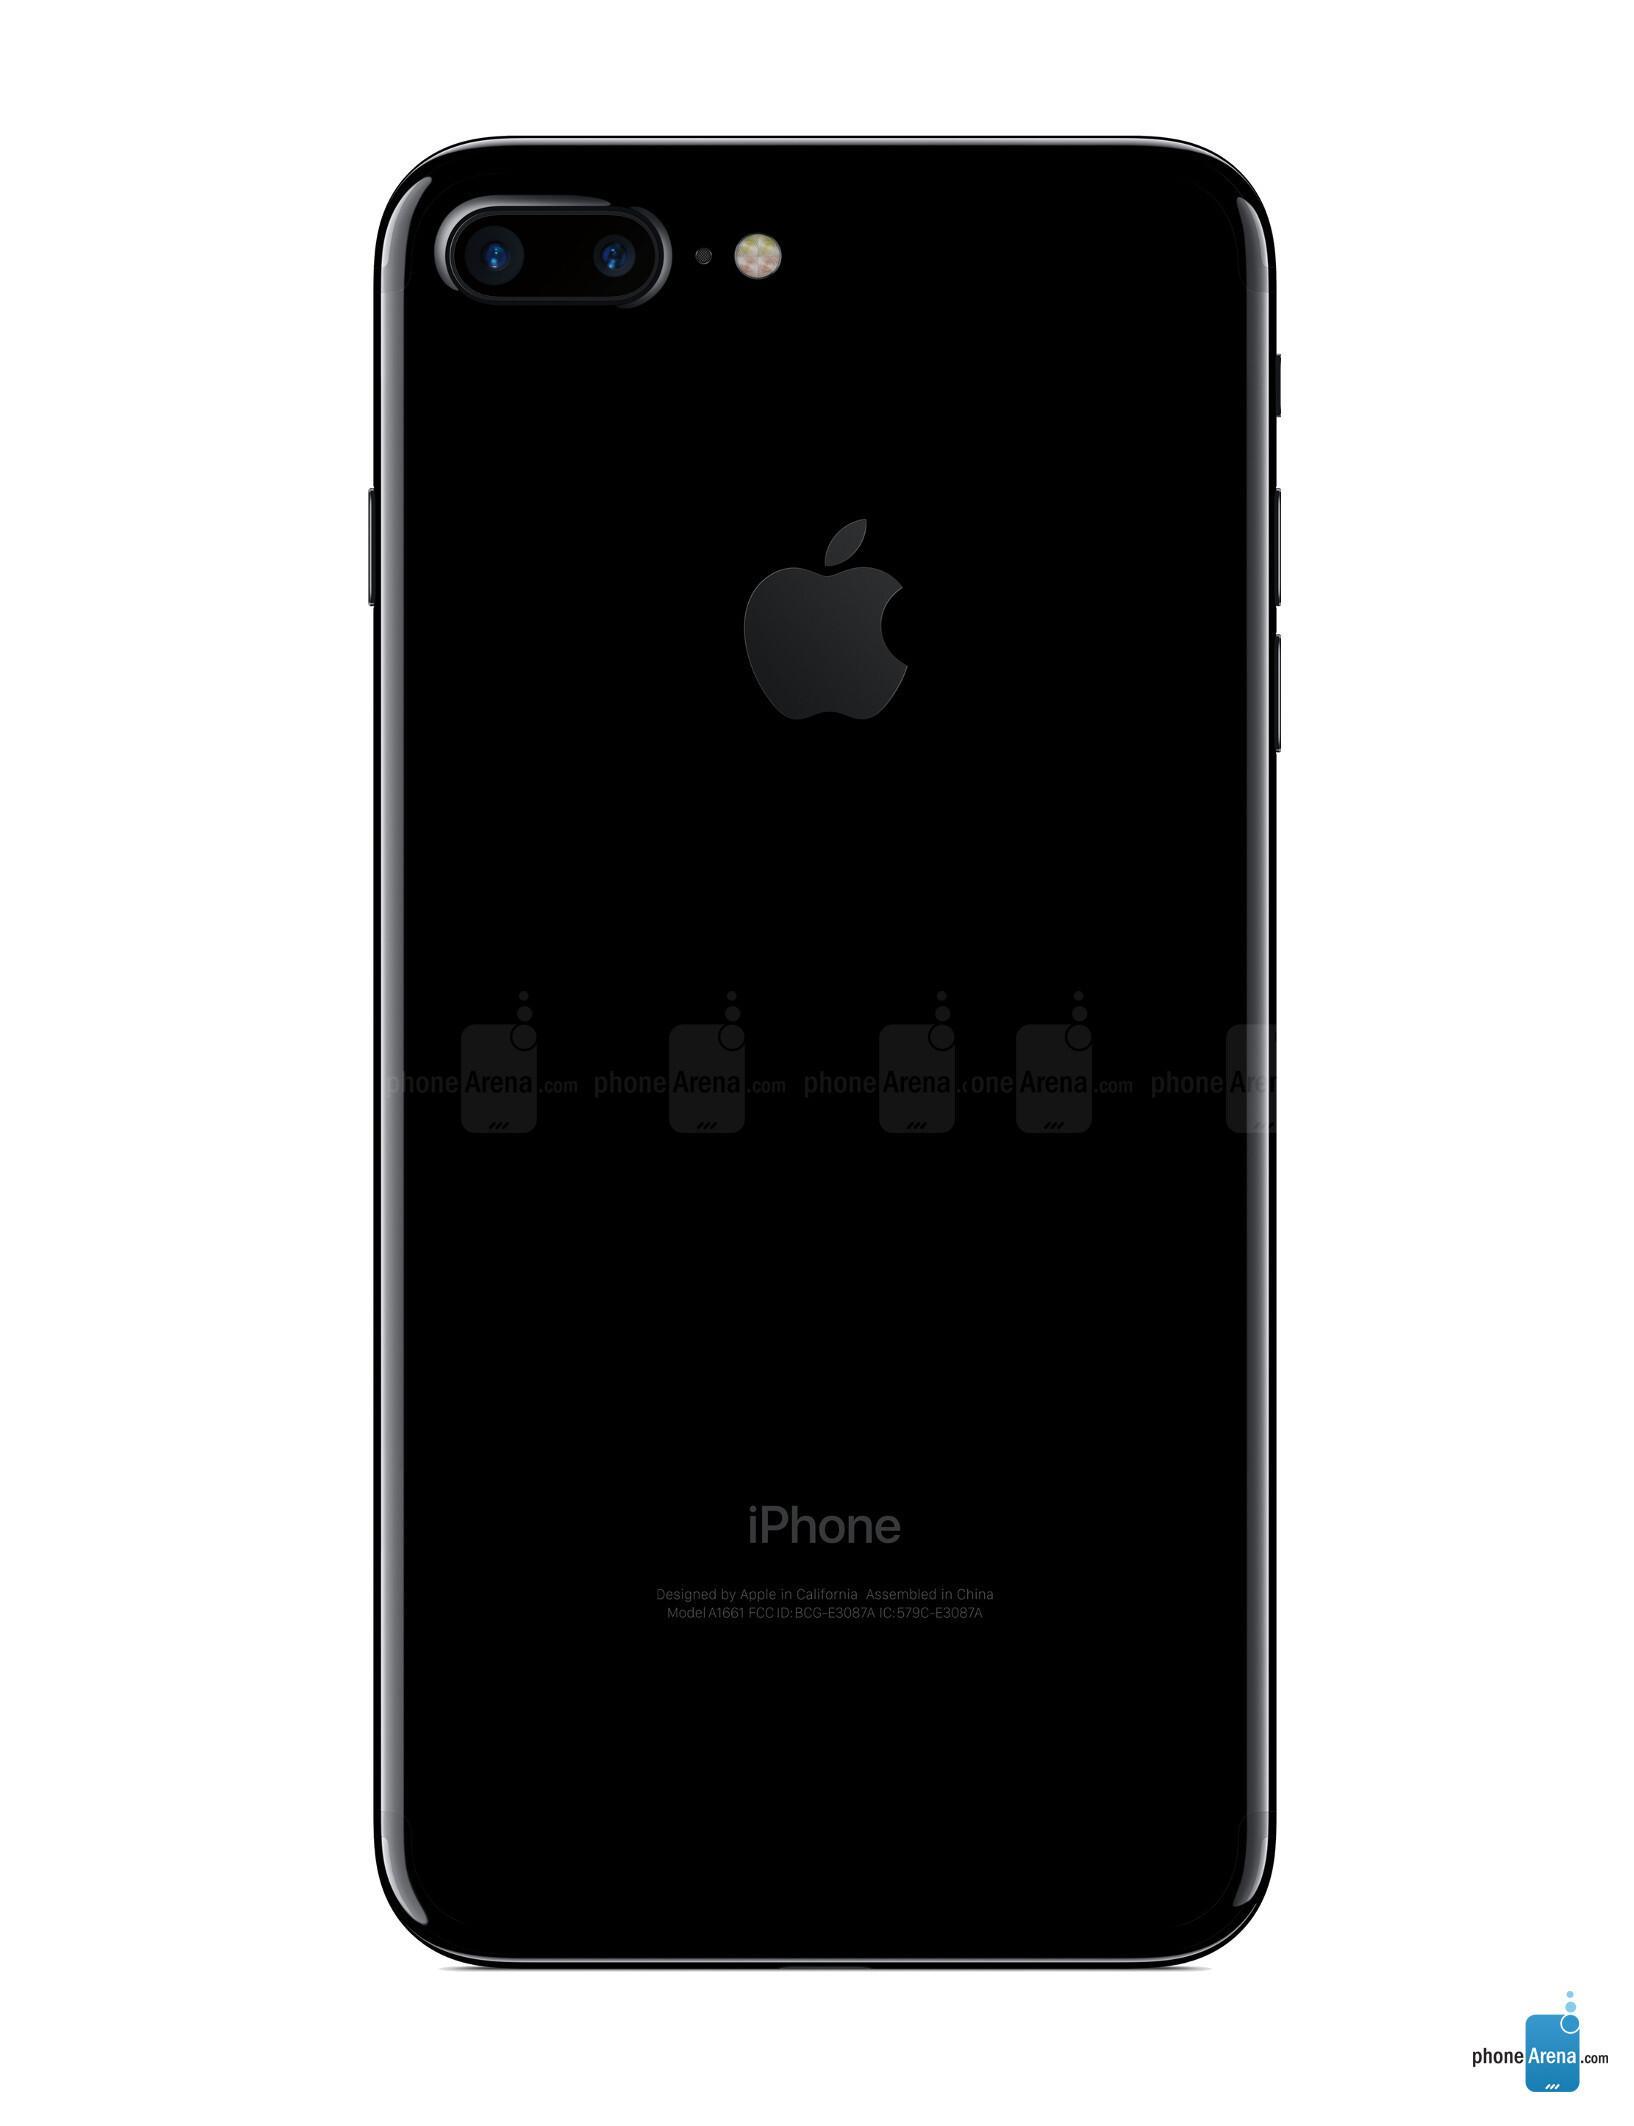 apple iphone 7 plus full specs. Black Bedroom Furniture Sets. Home Design Ideas